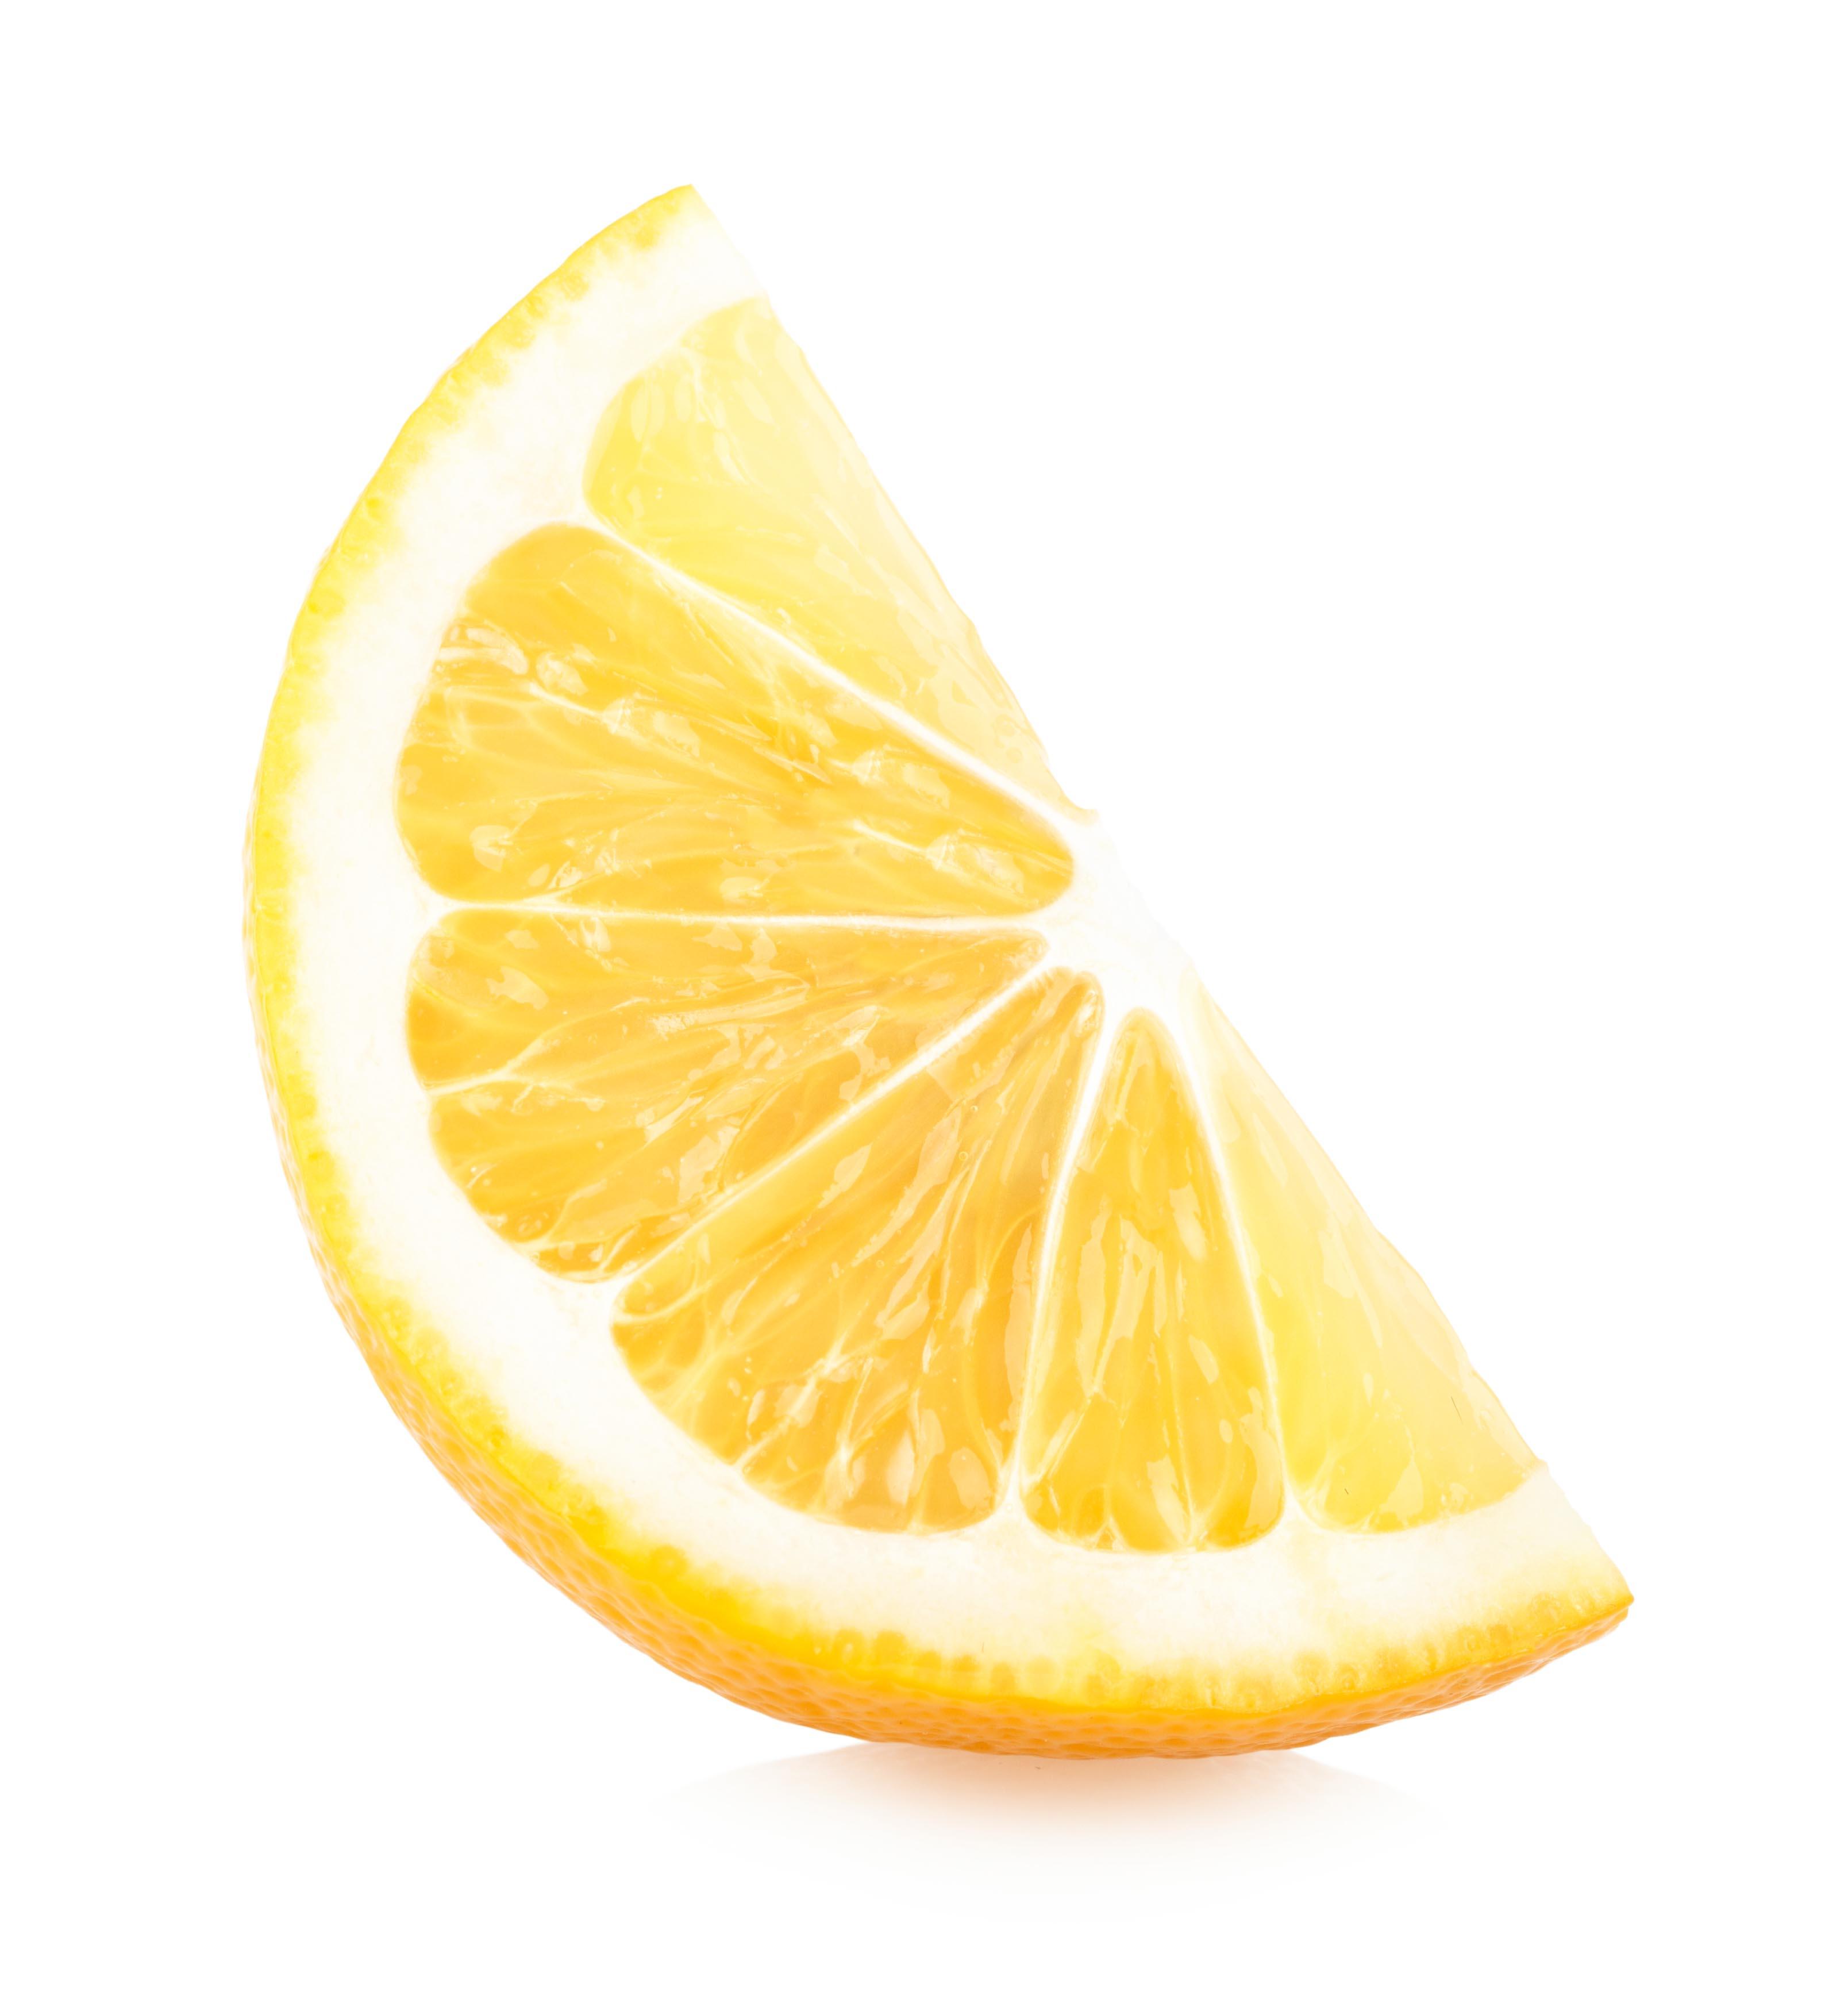 Lemon Slice, 1, Refreshing, Leaf, Lemon, HQ Photo